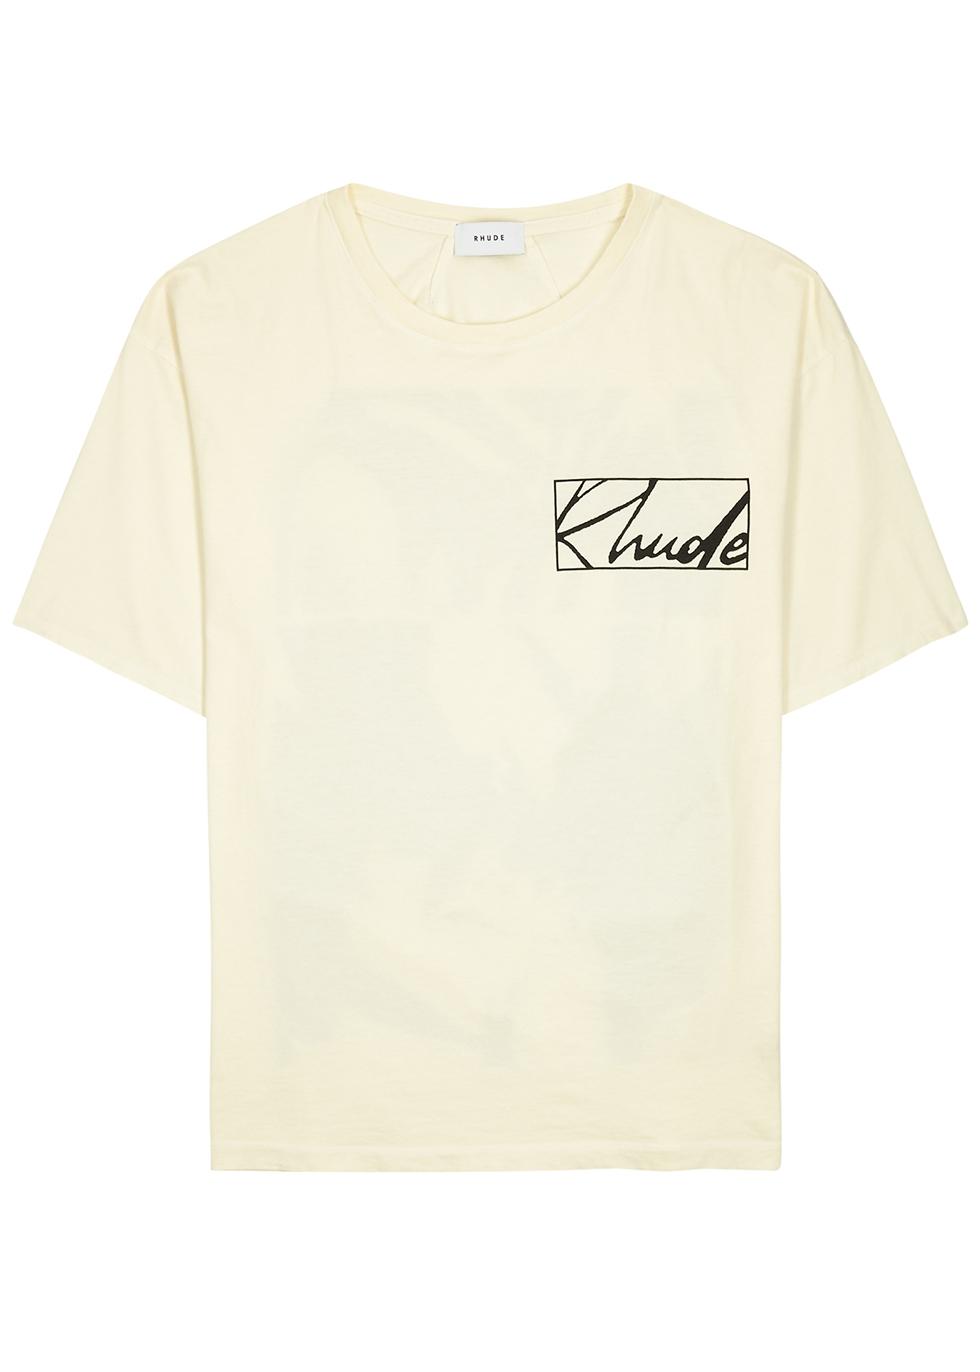 Theorist cream printed cotton T-shirt